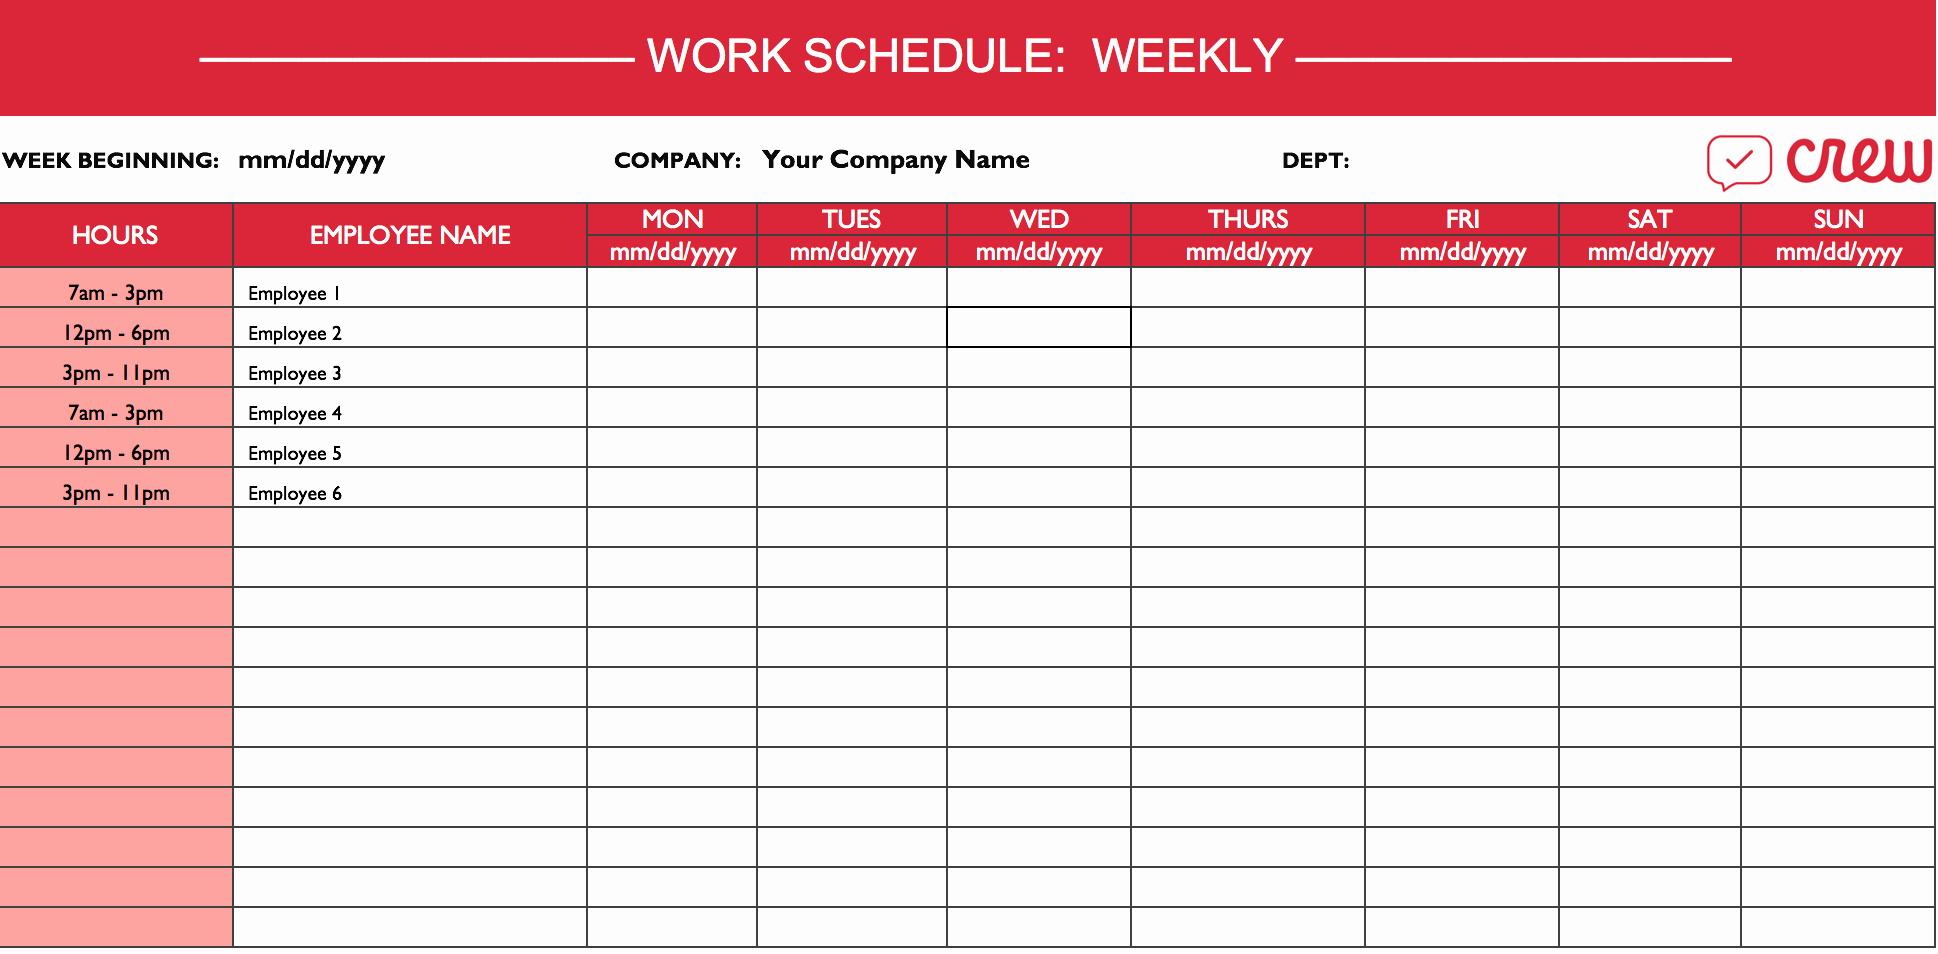 Weekly Employee Schedule Template Excel Luxury Weekly Work Schedule Template I Crew